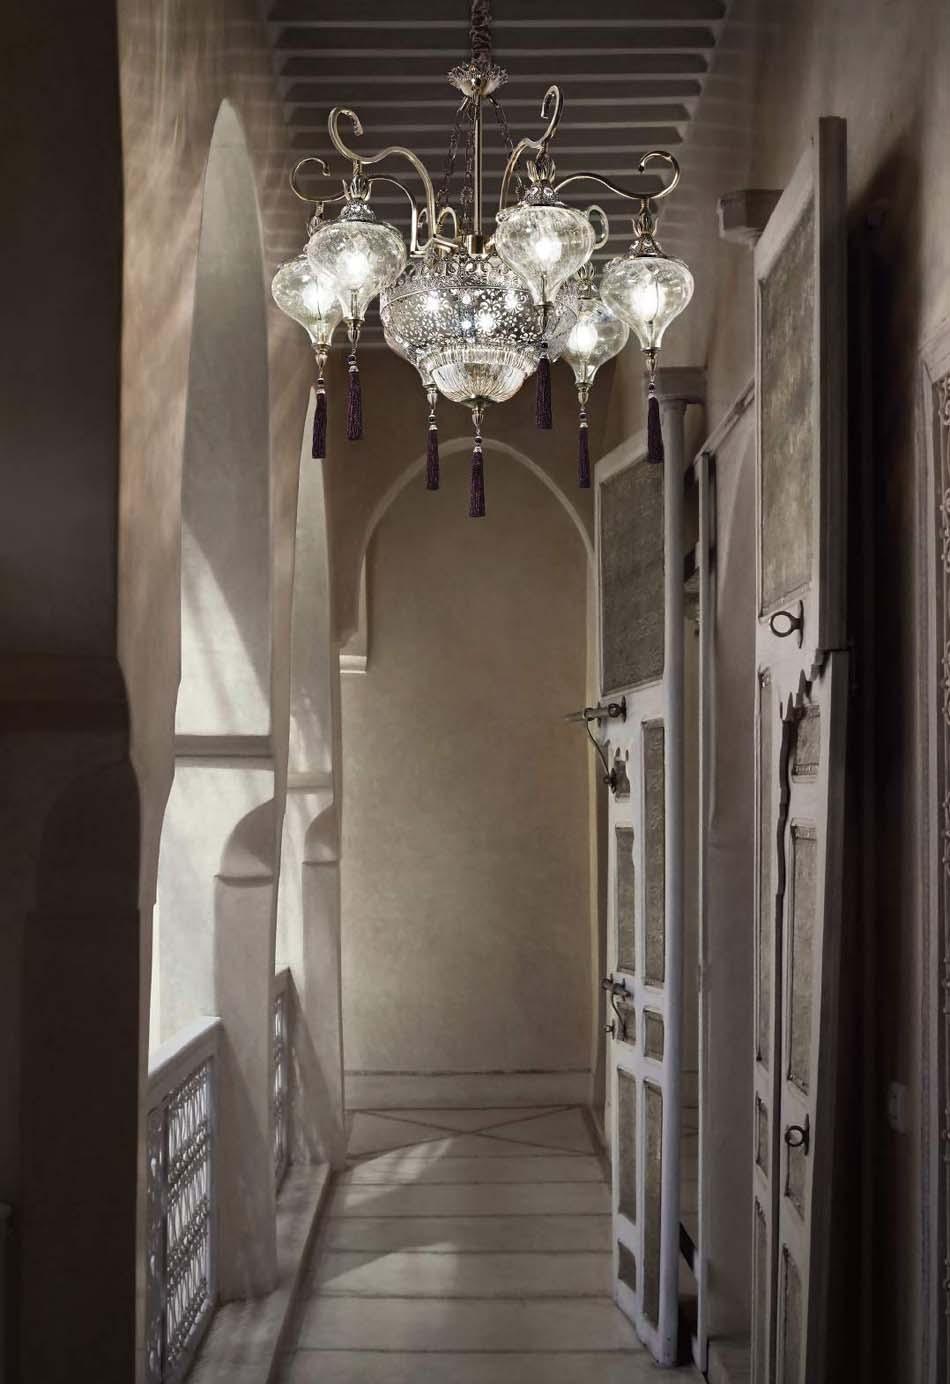 Lampade 64 sospese vintage Ideal Lux Harem – Toscana Arredamenti